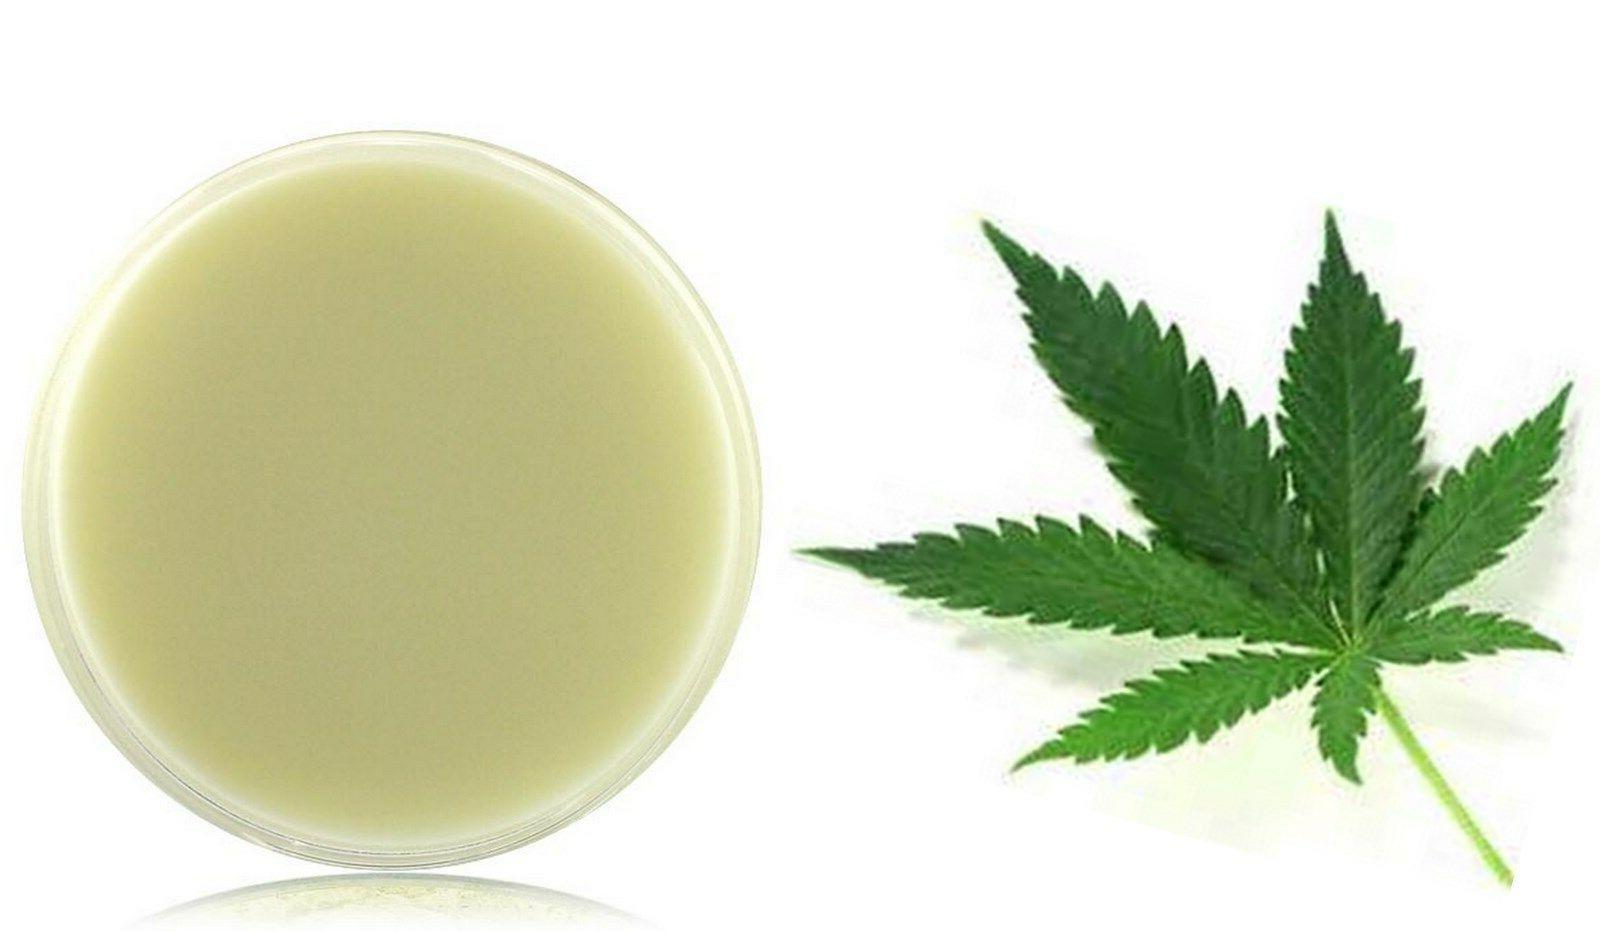 Hemp Organic Hippie Body Butter Cream Eczema,Psoriasis,Acne,